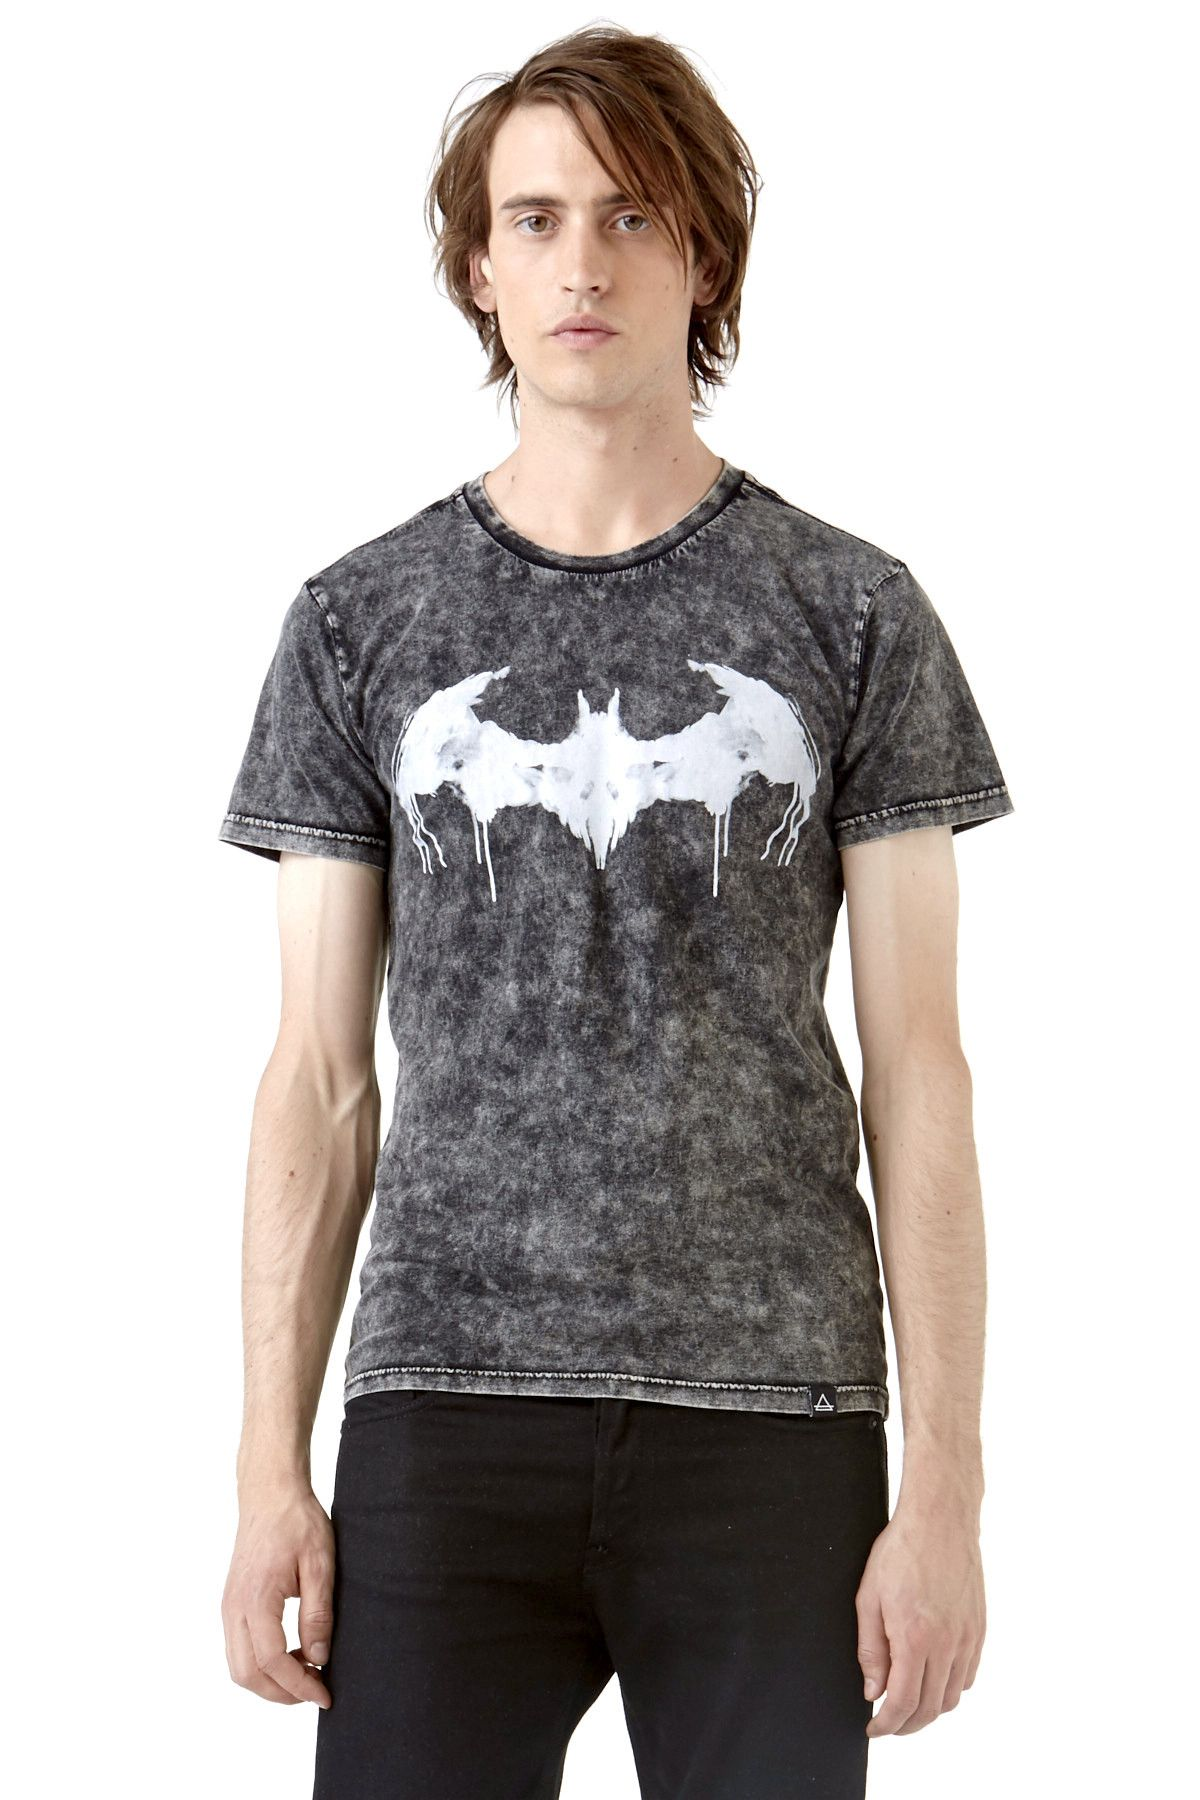 LIBAT M T-Shirt